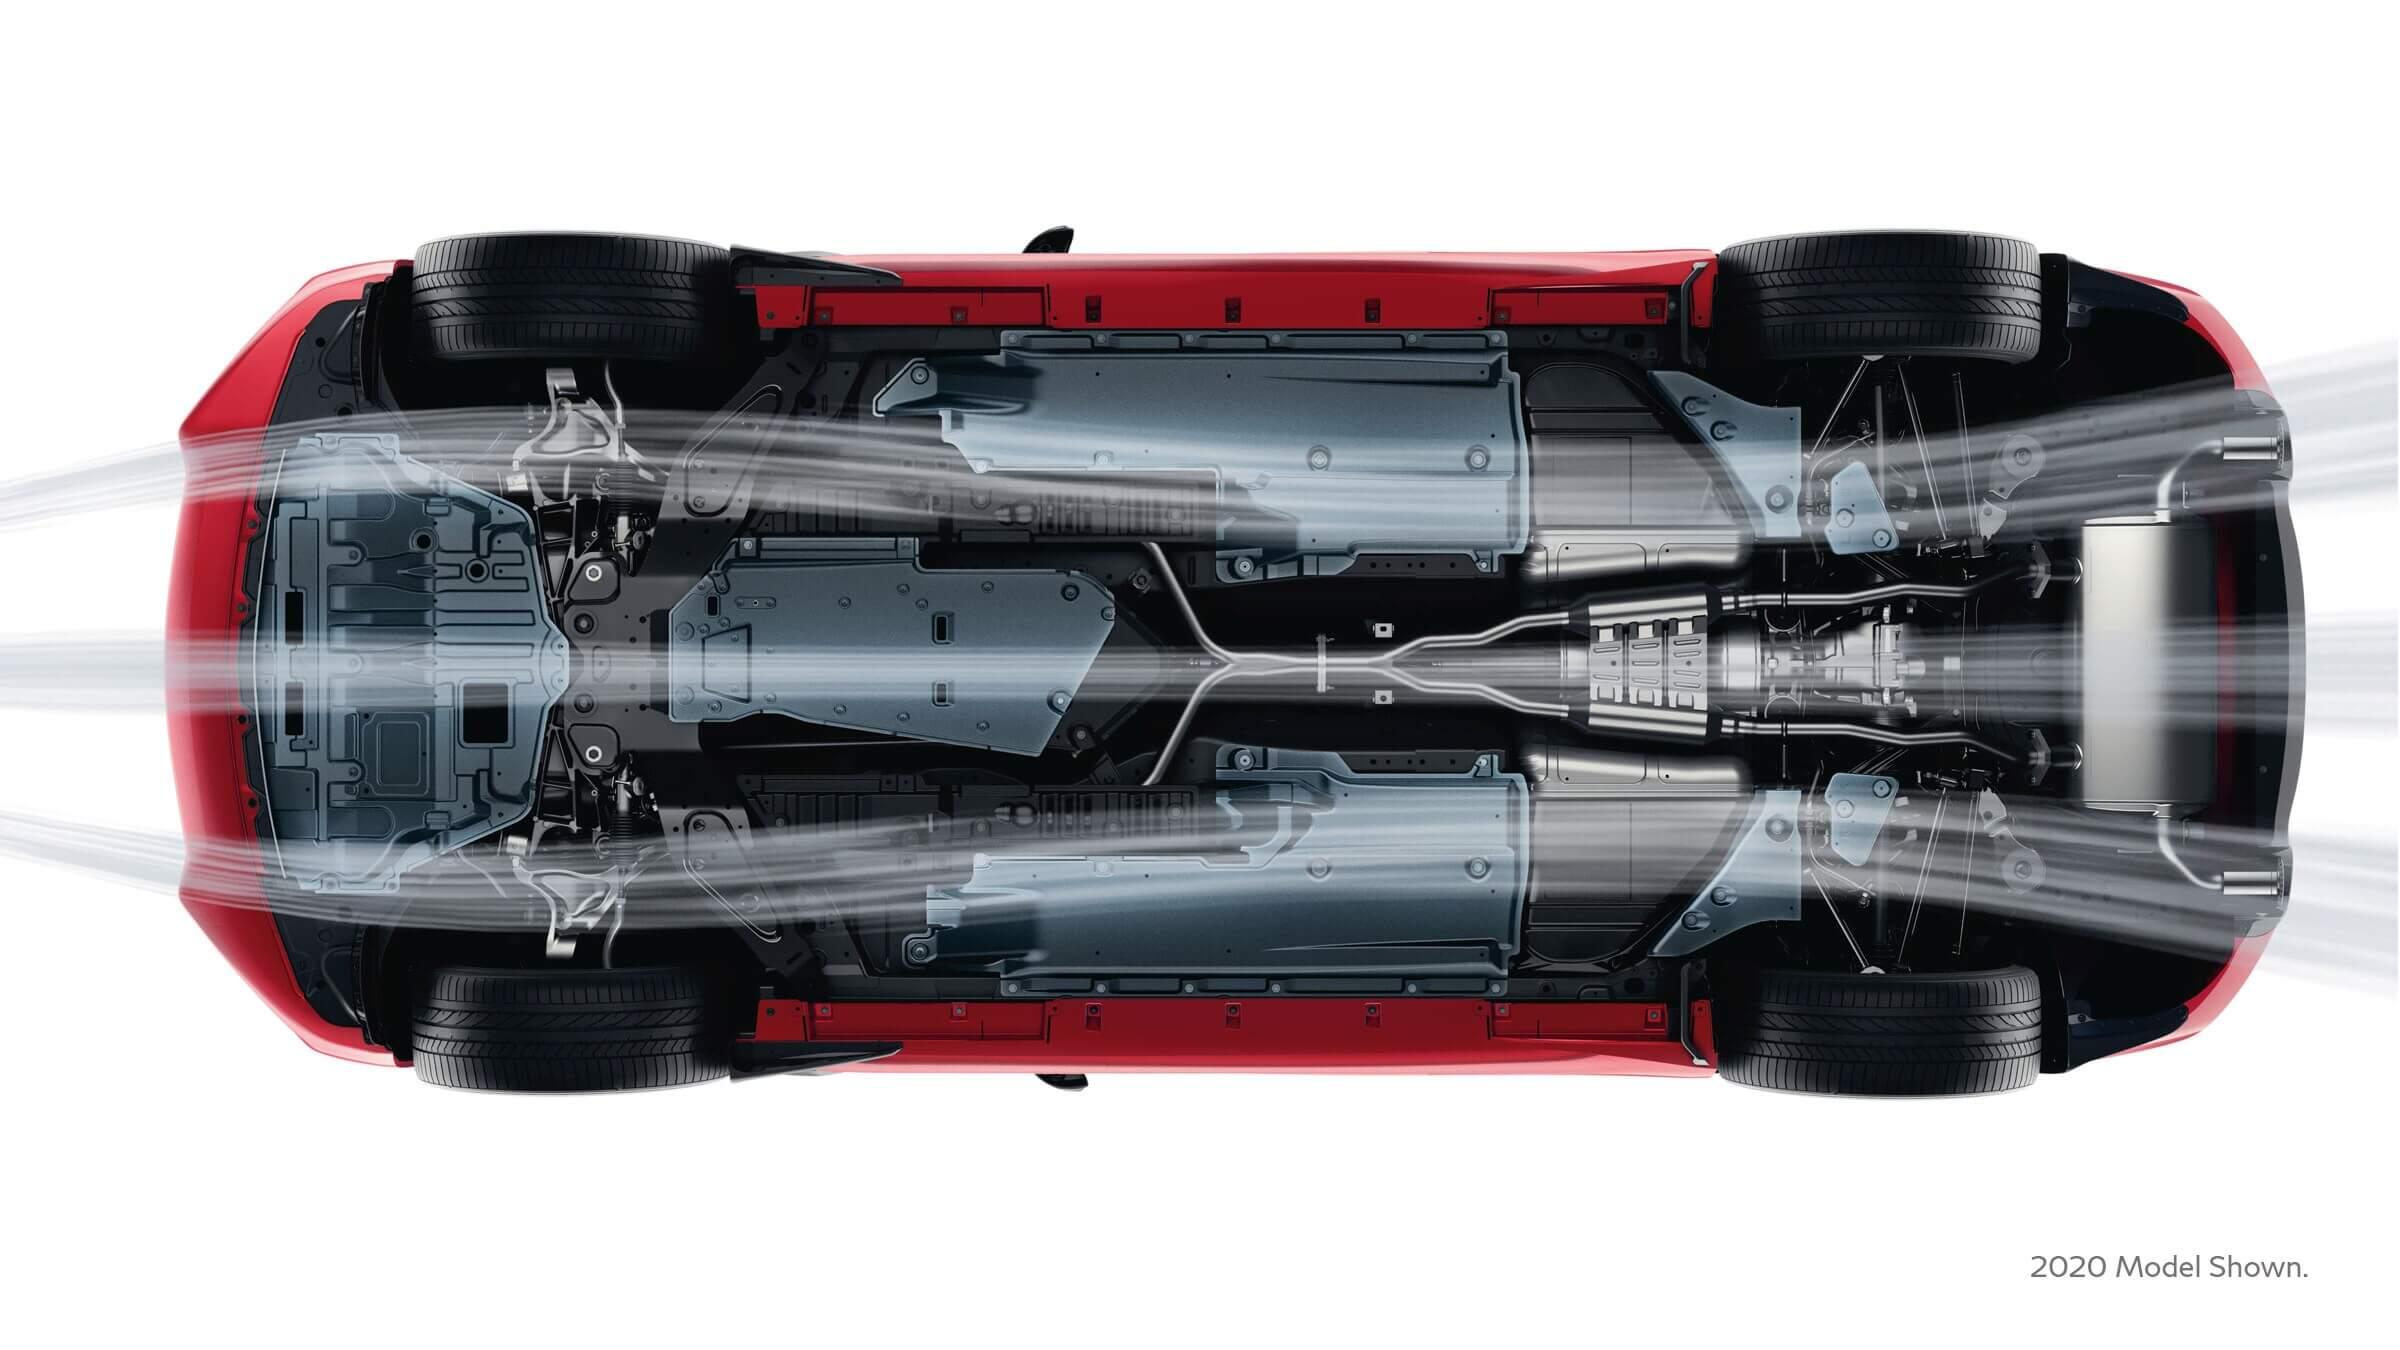 2021 Infiniti Q60 with zero lift front and rear aerodynamics